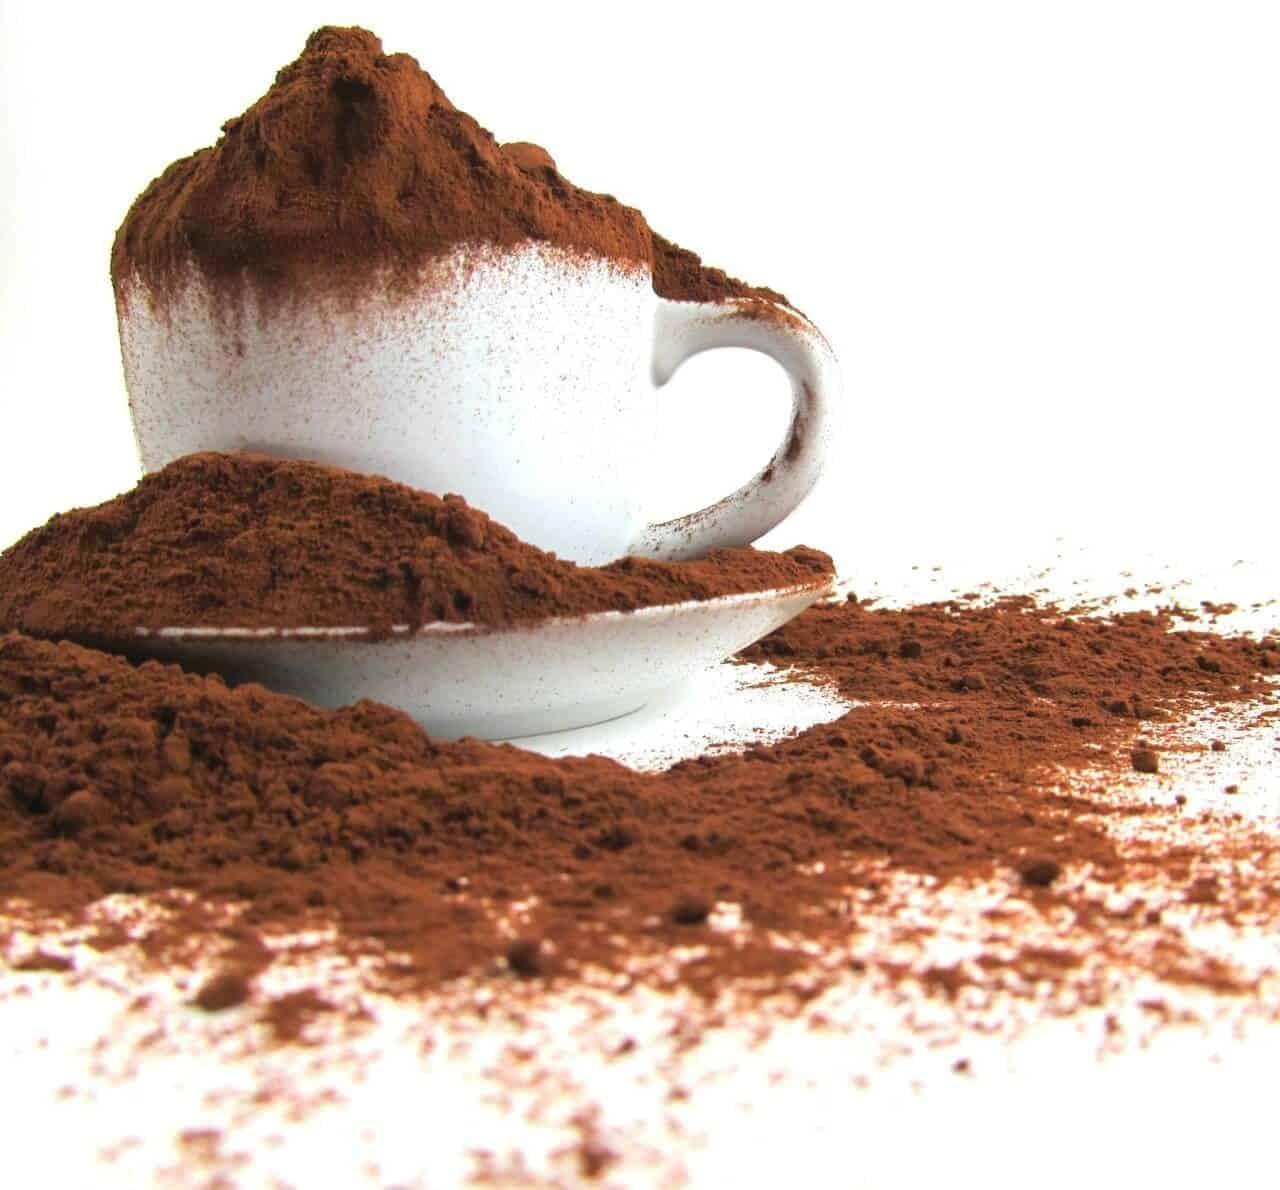 Bubuk Coklat Minuman Aneka Rasa +Tips Bisnis Jual Minuman Coklat